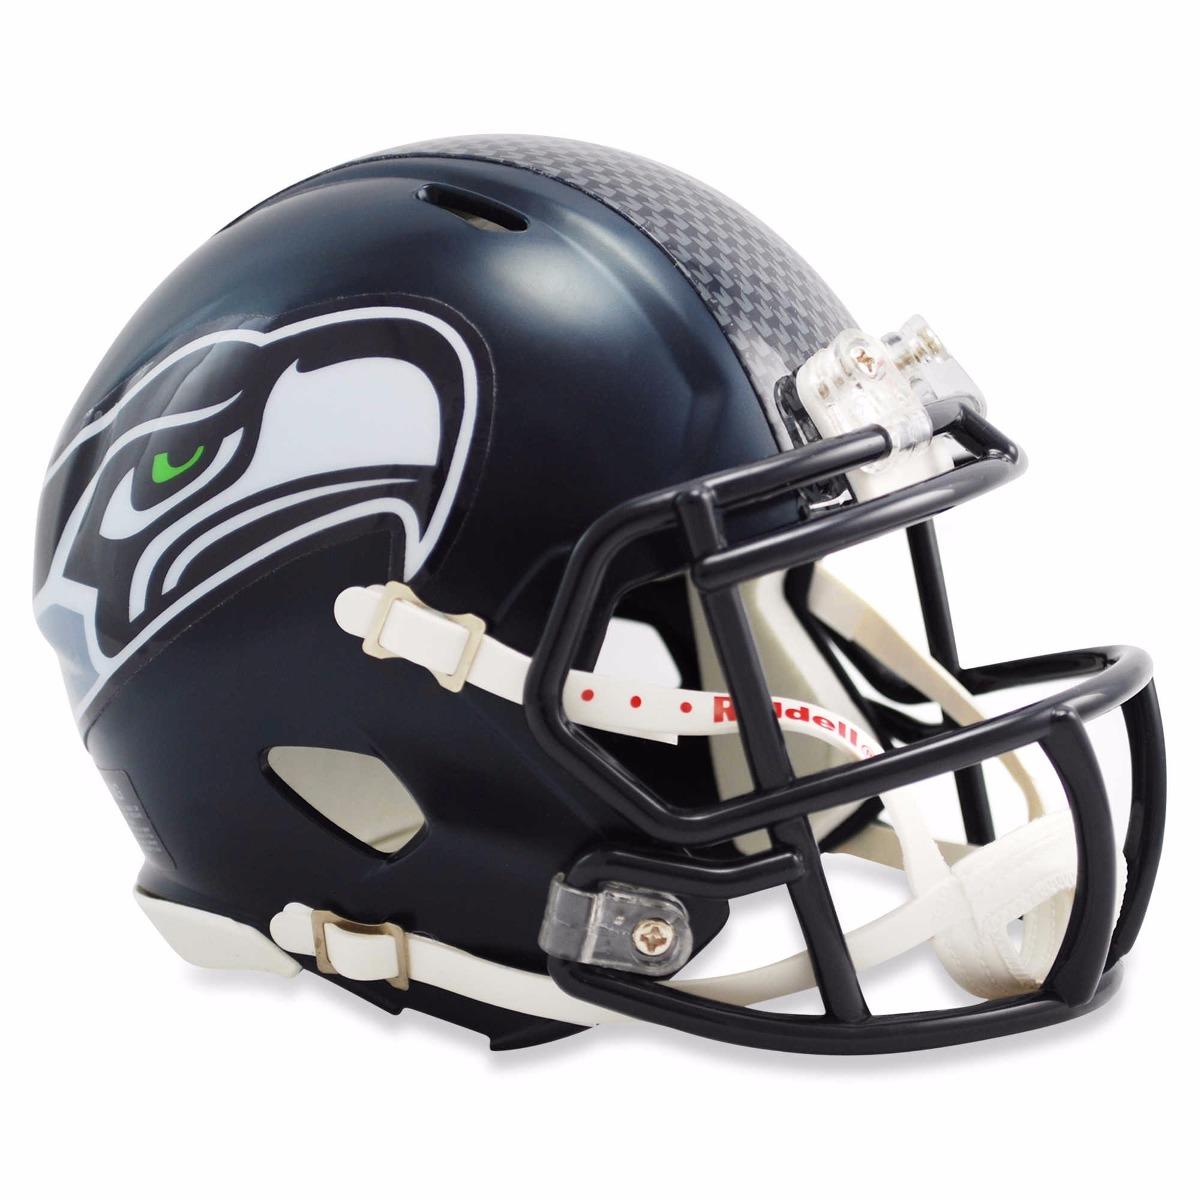 c771baf44 Mini Capacete Futebol Americano Nfl - Seattle Seahawks - R  280